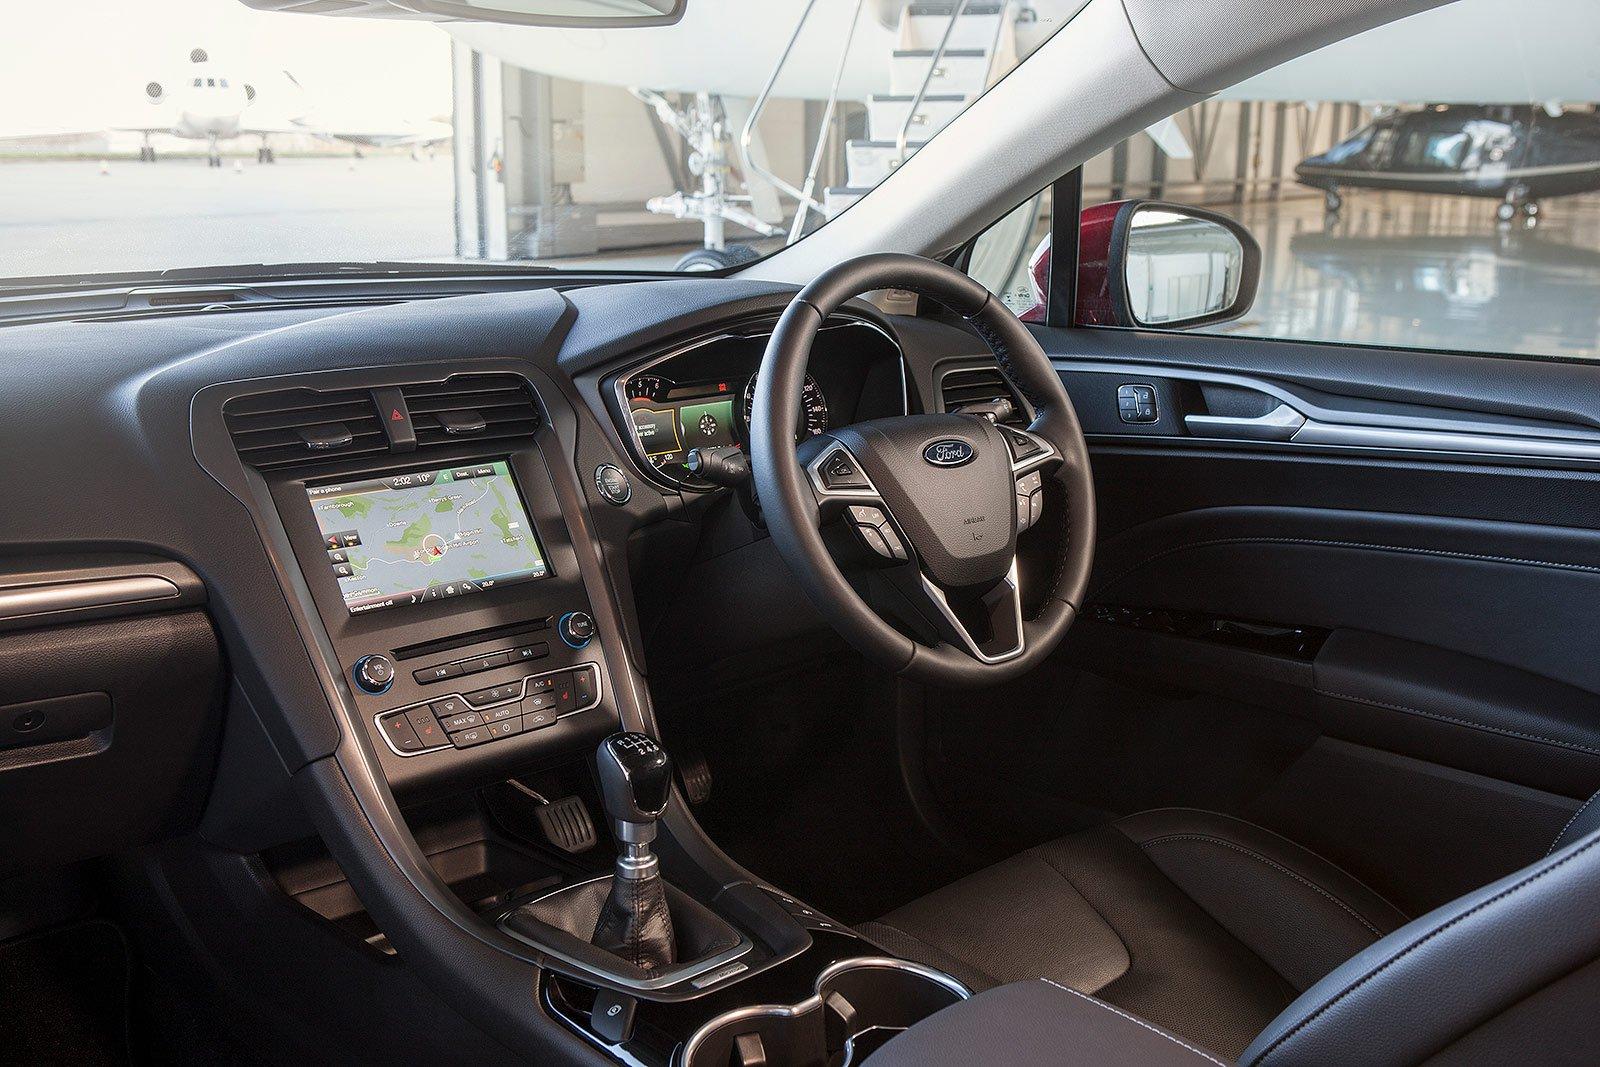 Ford Mondeo Titanium Edition HYBRID - interior